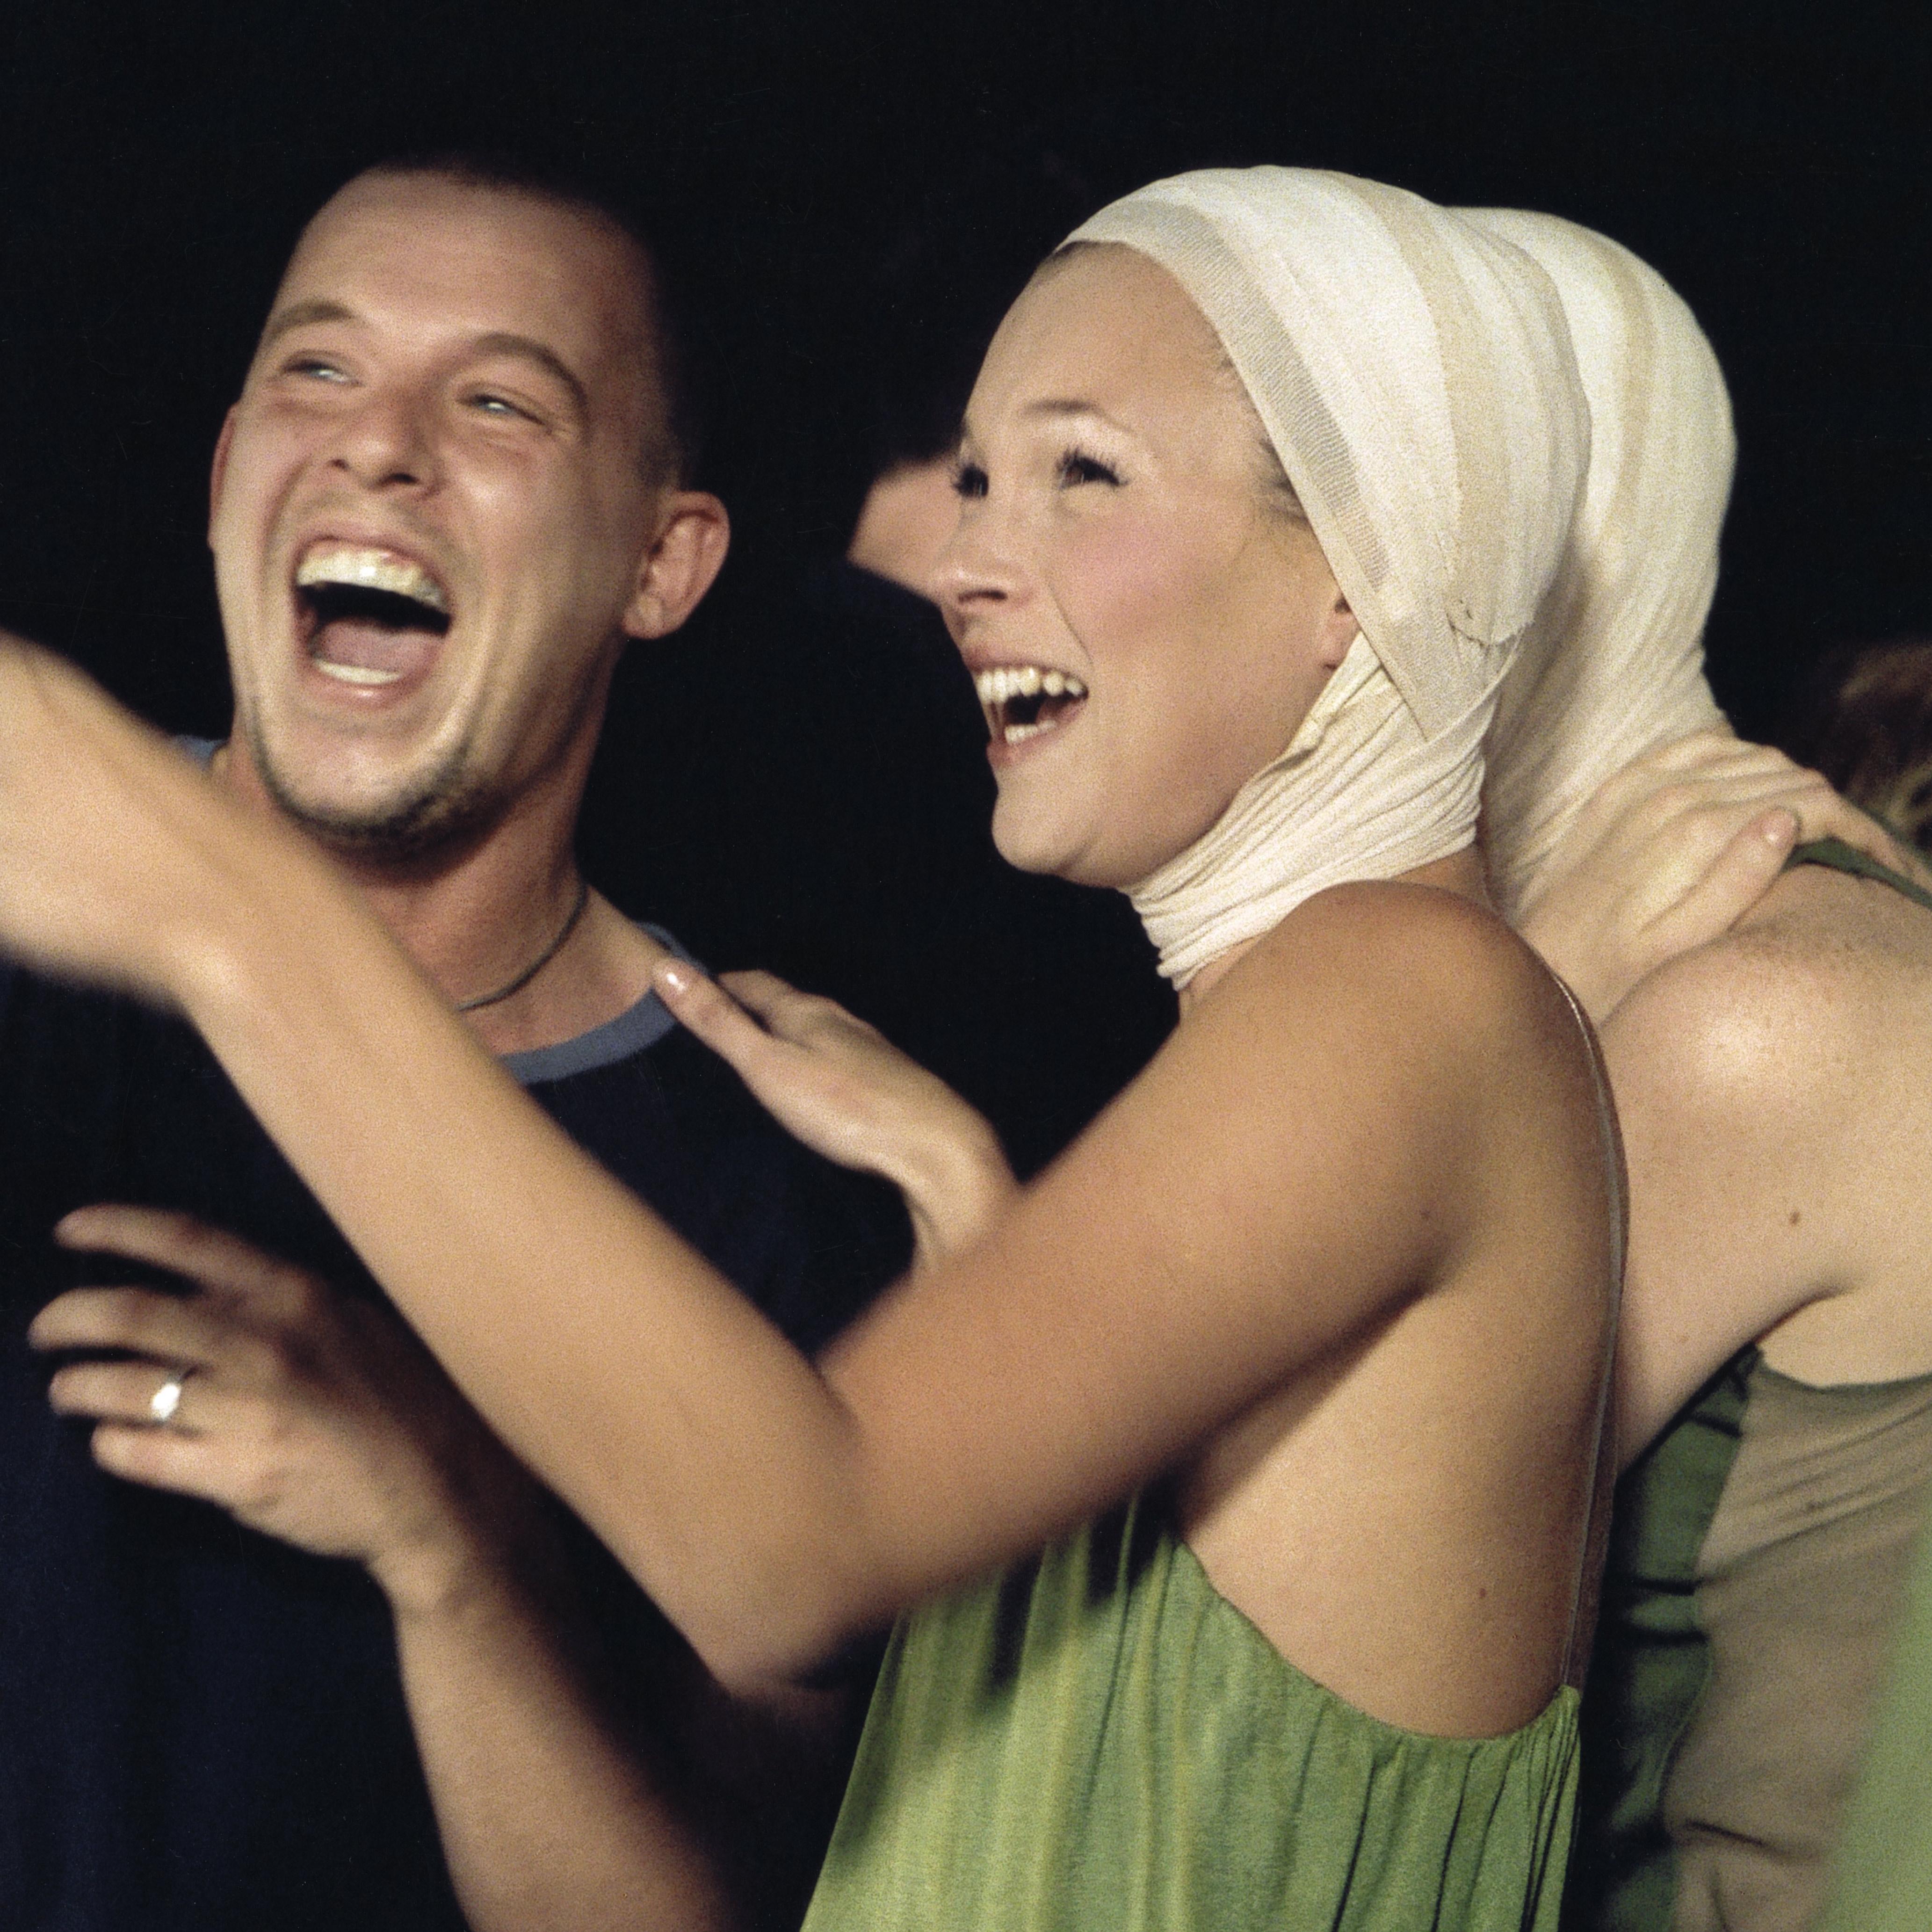 Alexander McQueen and Kate Moss